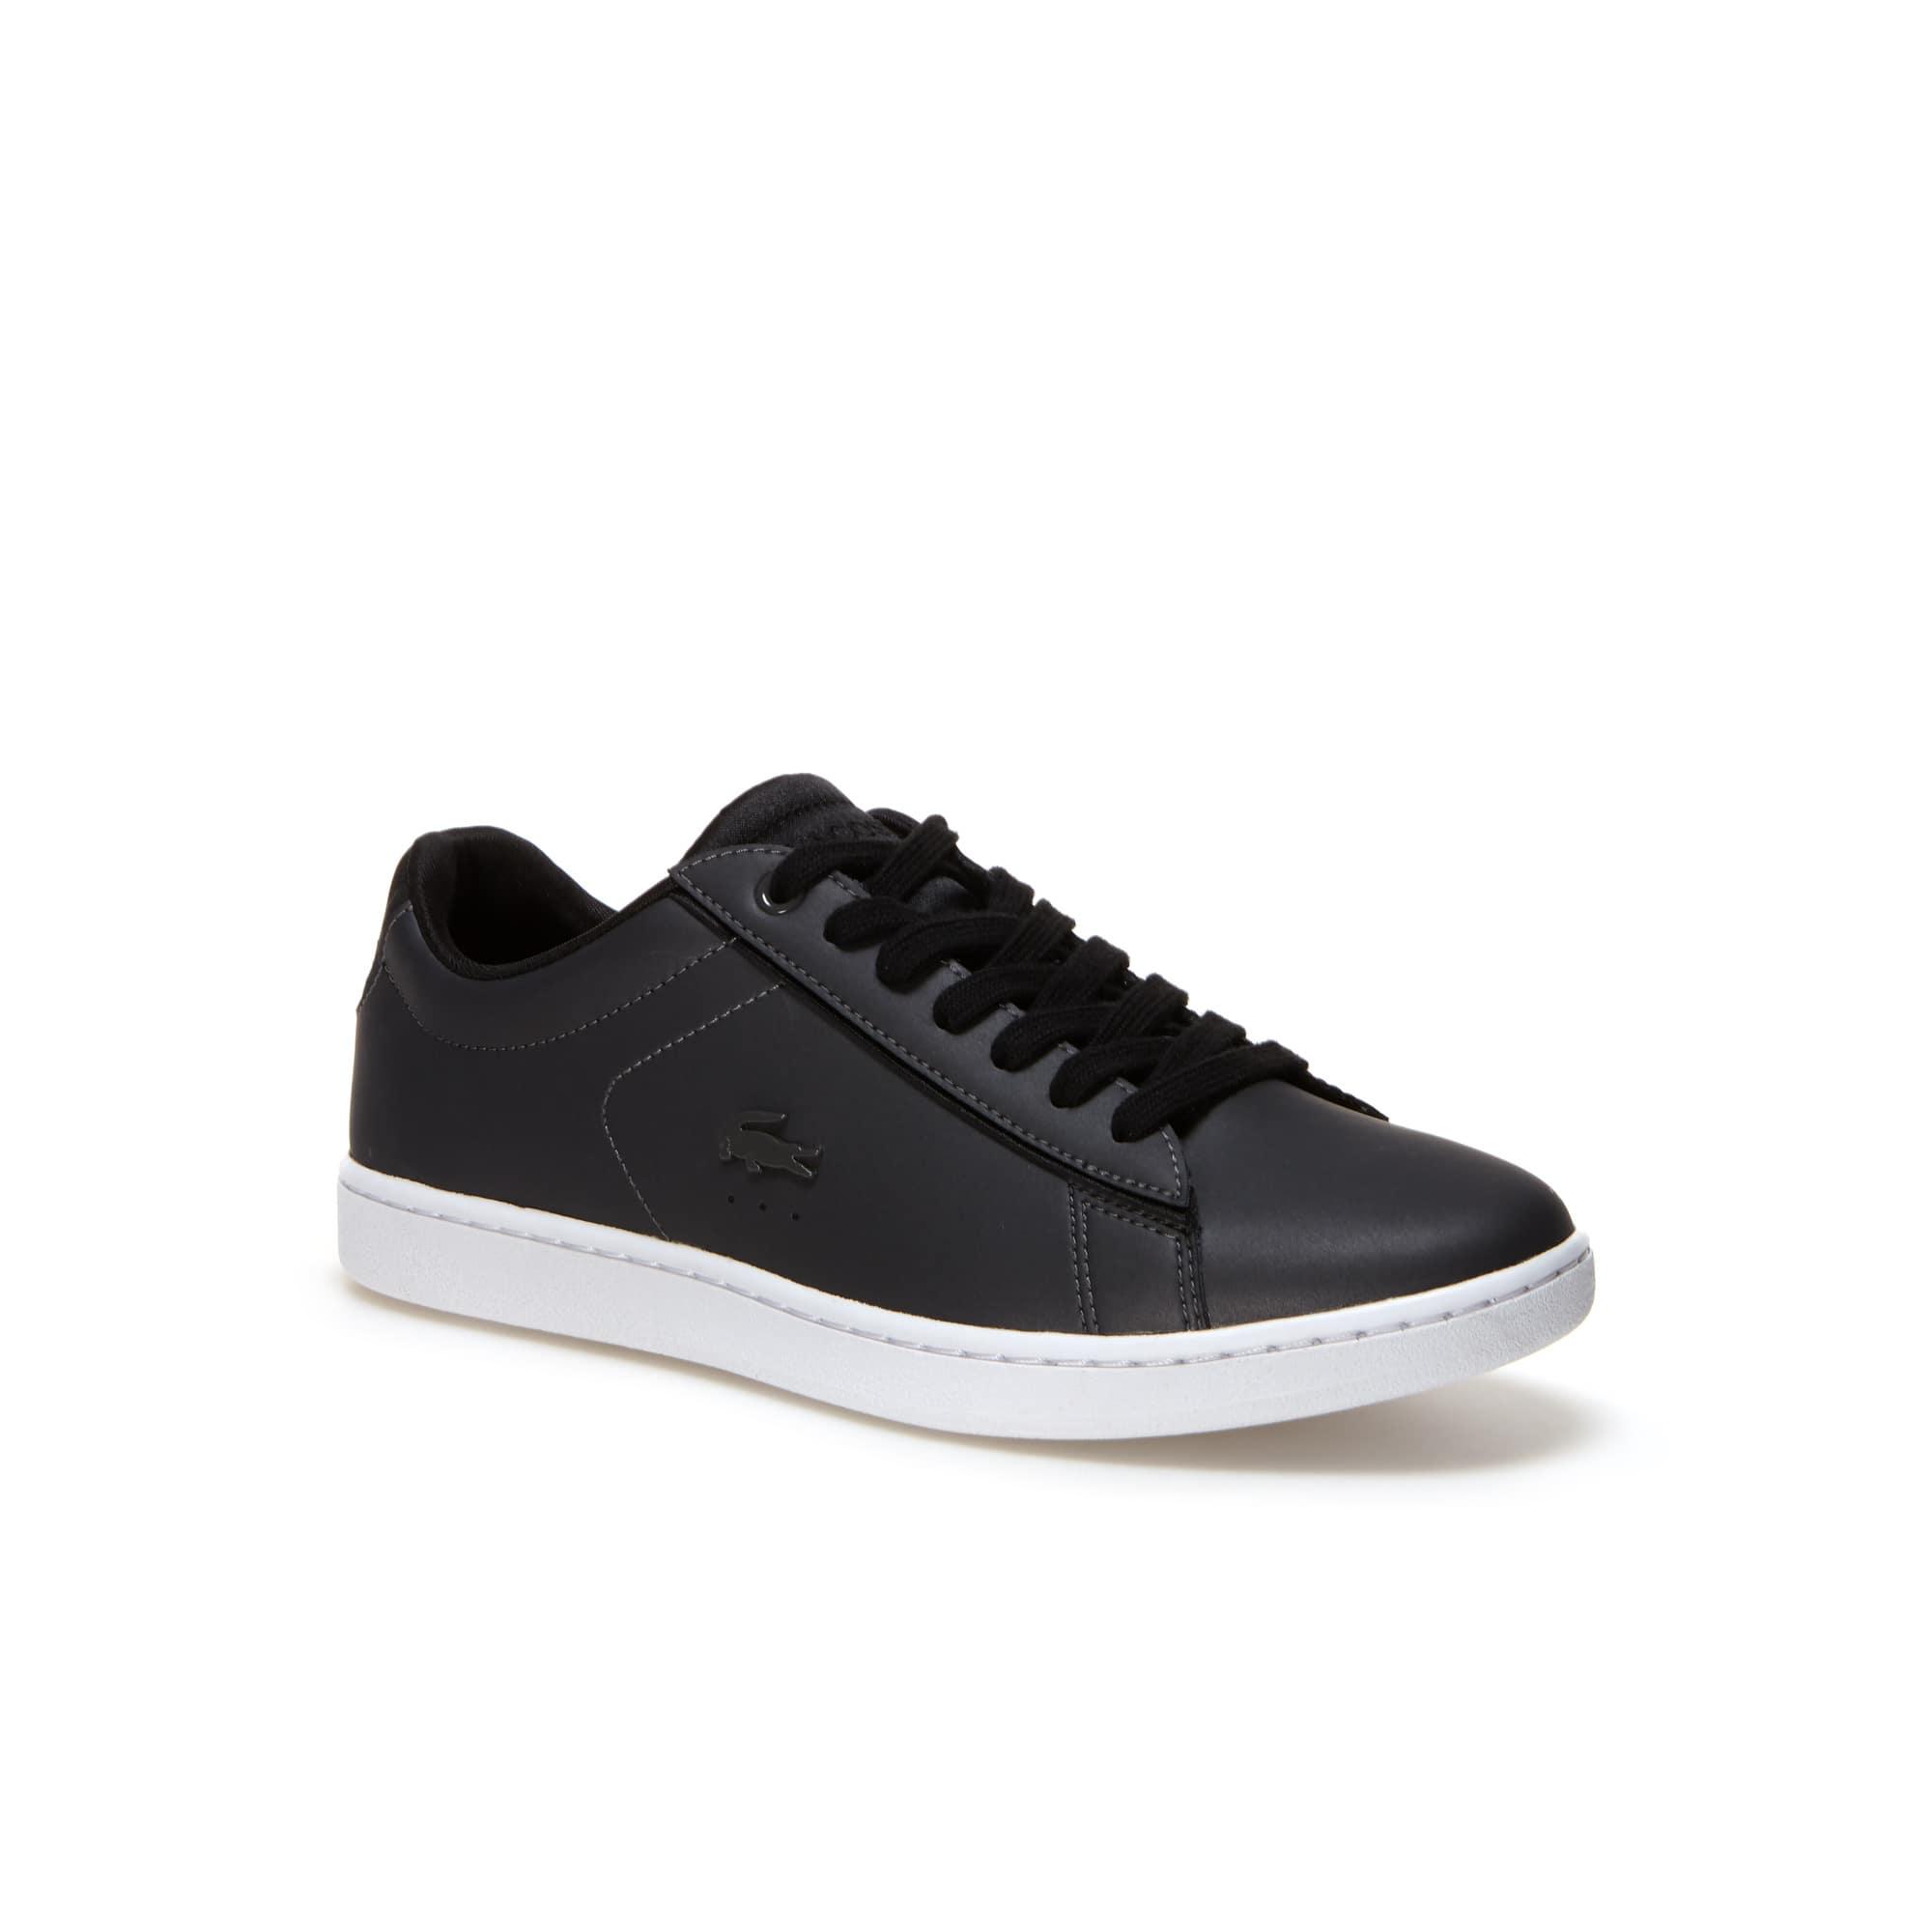 Damen-Sneakers CARNABY EVO aus Premium-Leder